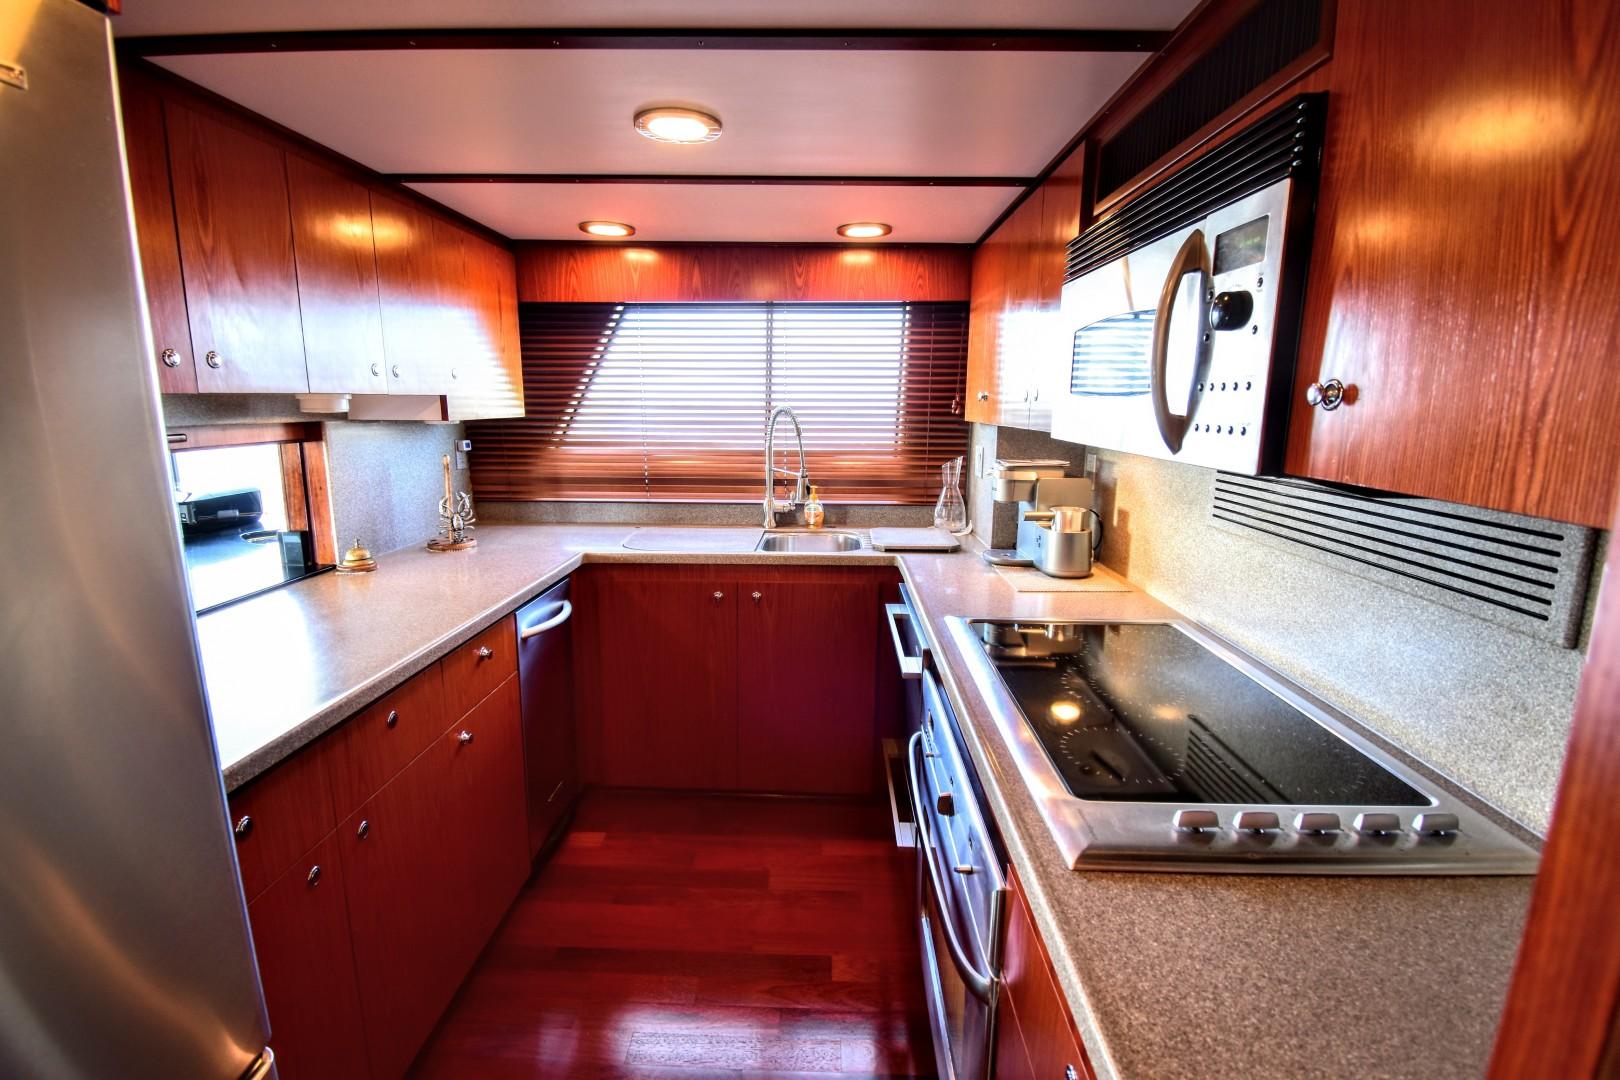 Hatteras-82 Cockpit Motor Yacht 1985-Papillon Seabrook-Texas-United States-Hatteras Motor Yacht 1985 Papillon Galley-1345380 | Thumbnail